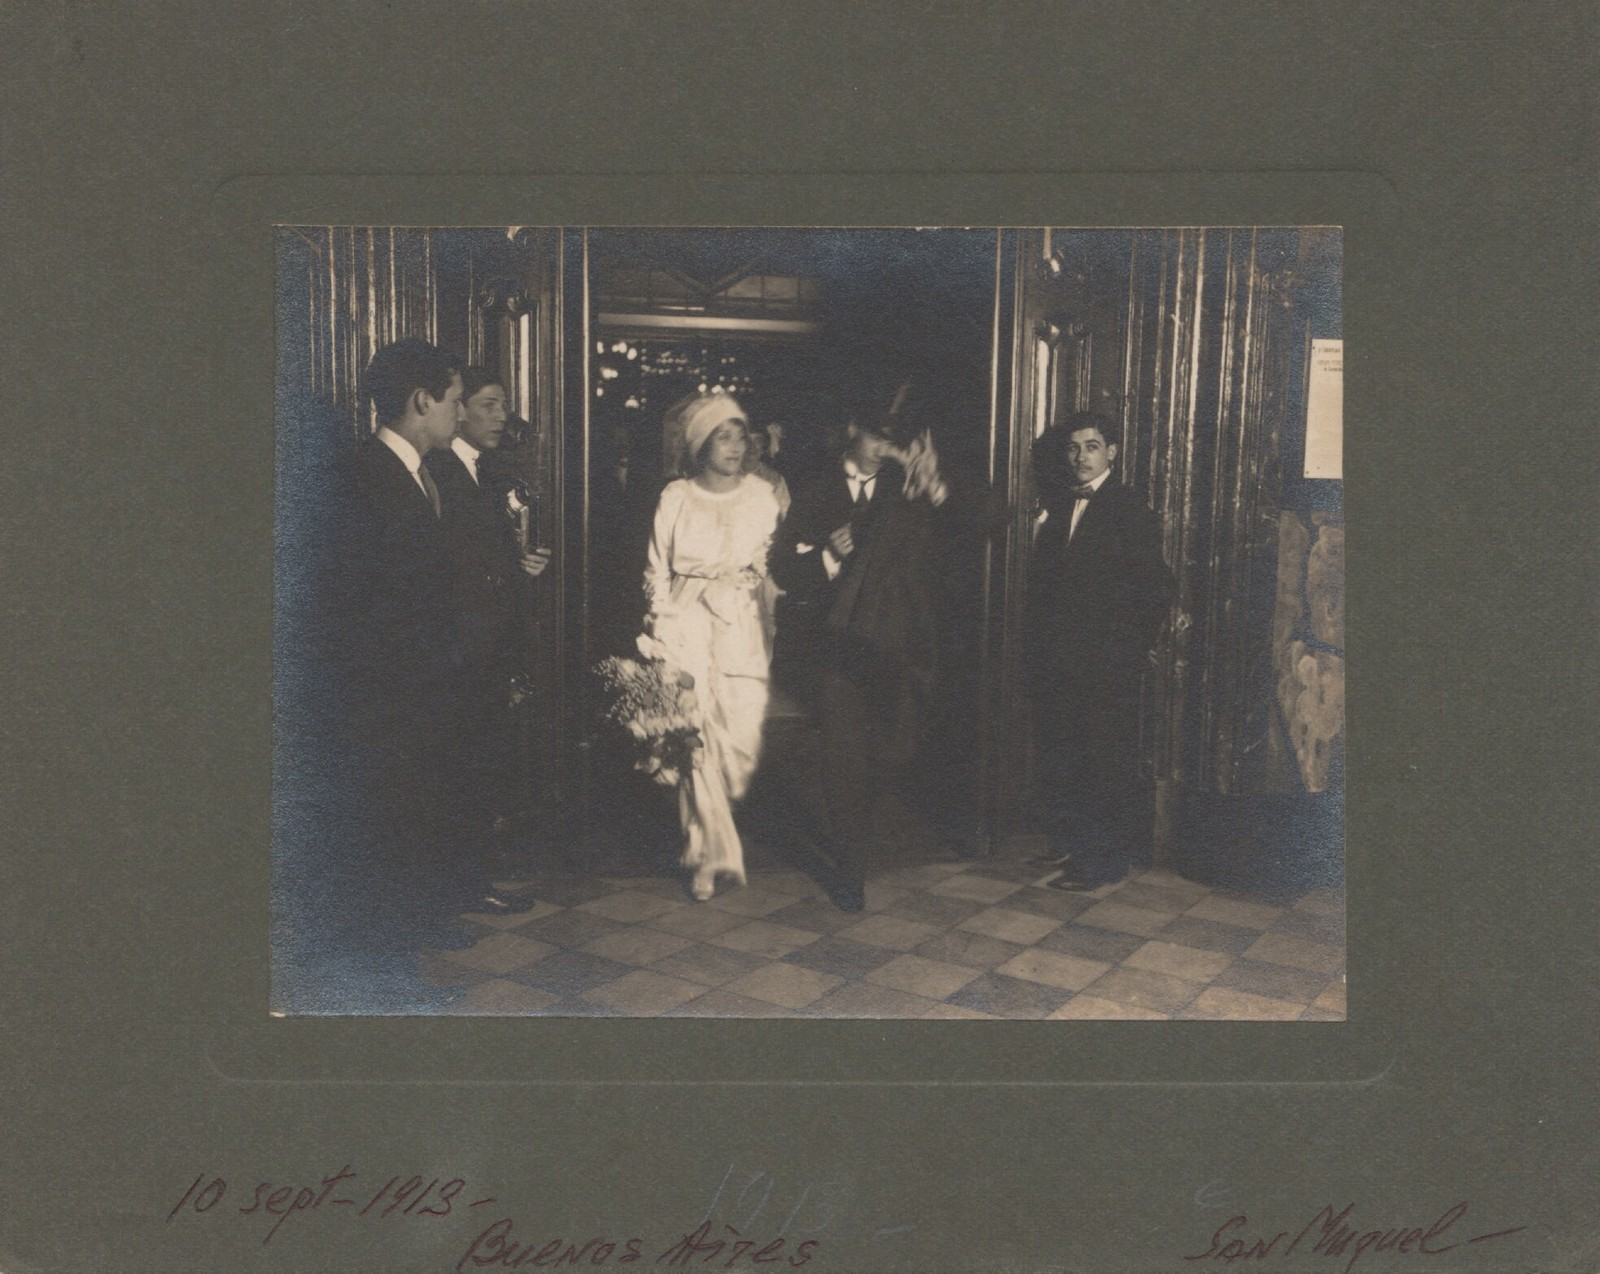 Photograph of Vaslav Nijinsky and Romola de Pulszky on their wedding day, 1913